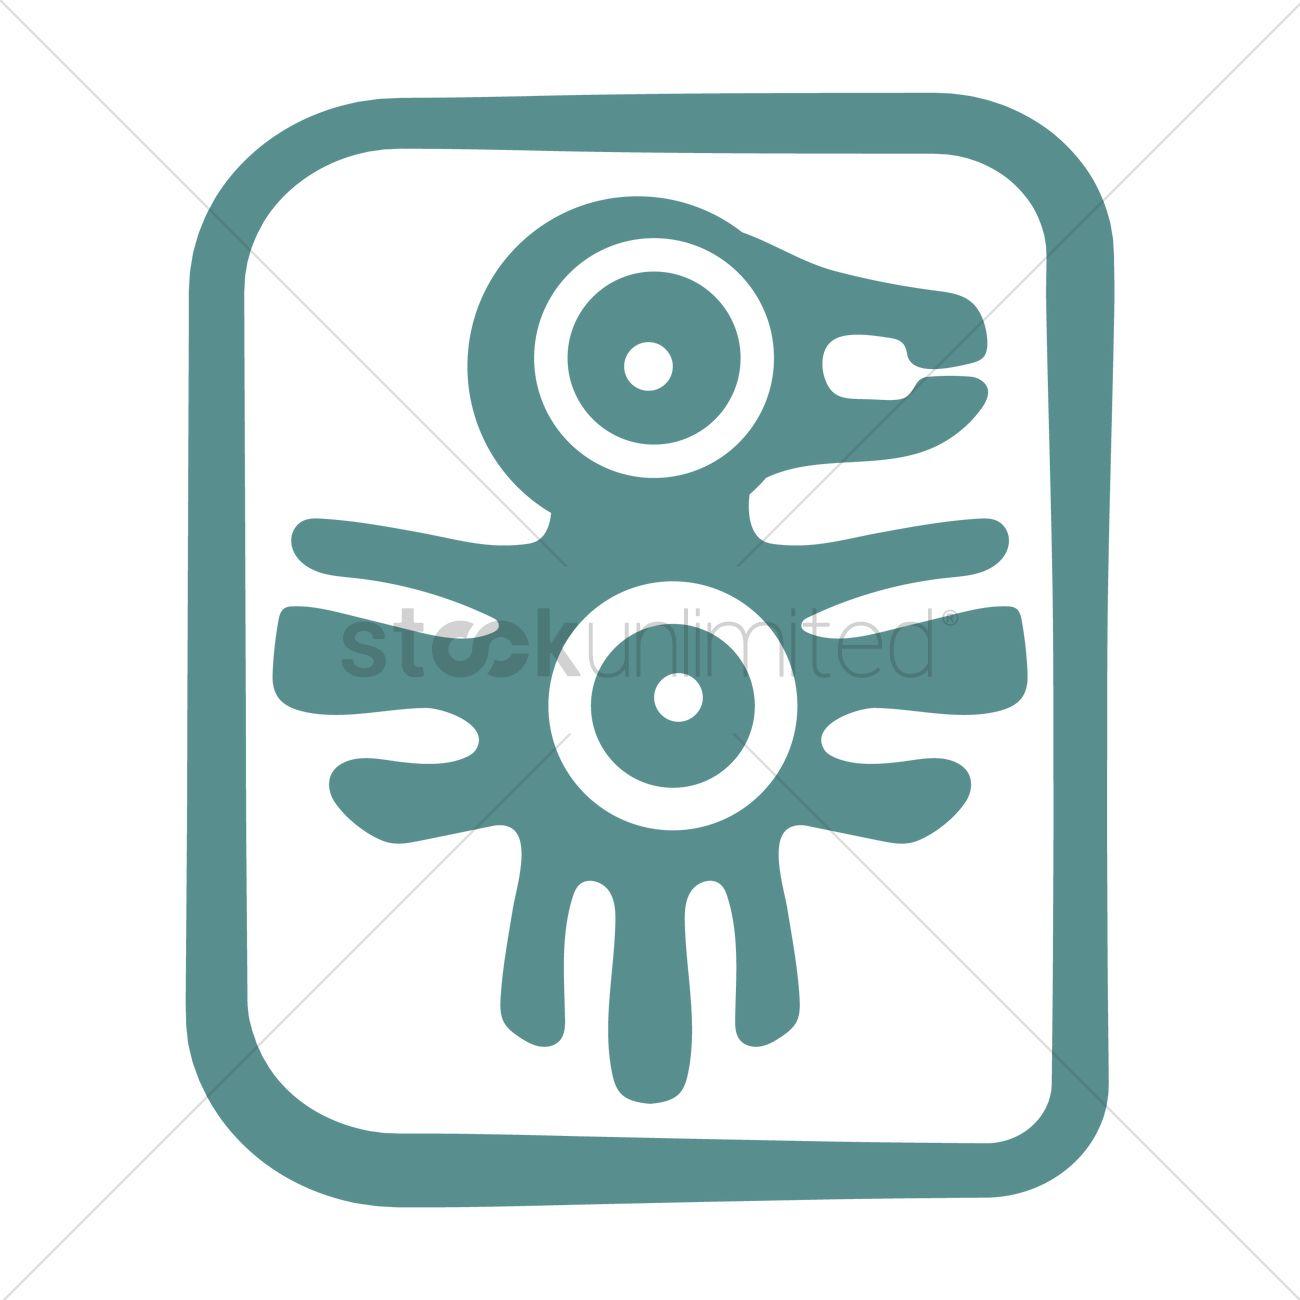 Aztec Symbol Design Vector Image 2014263 Stockunlimited